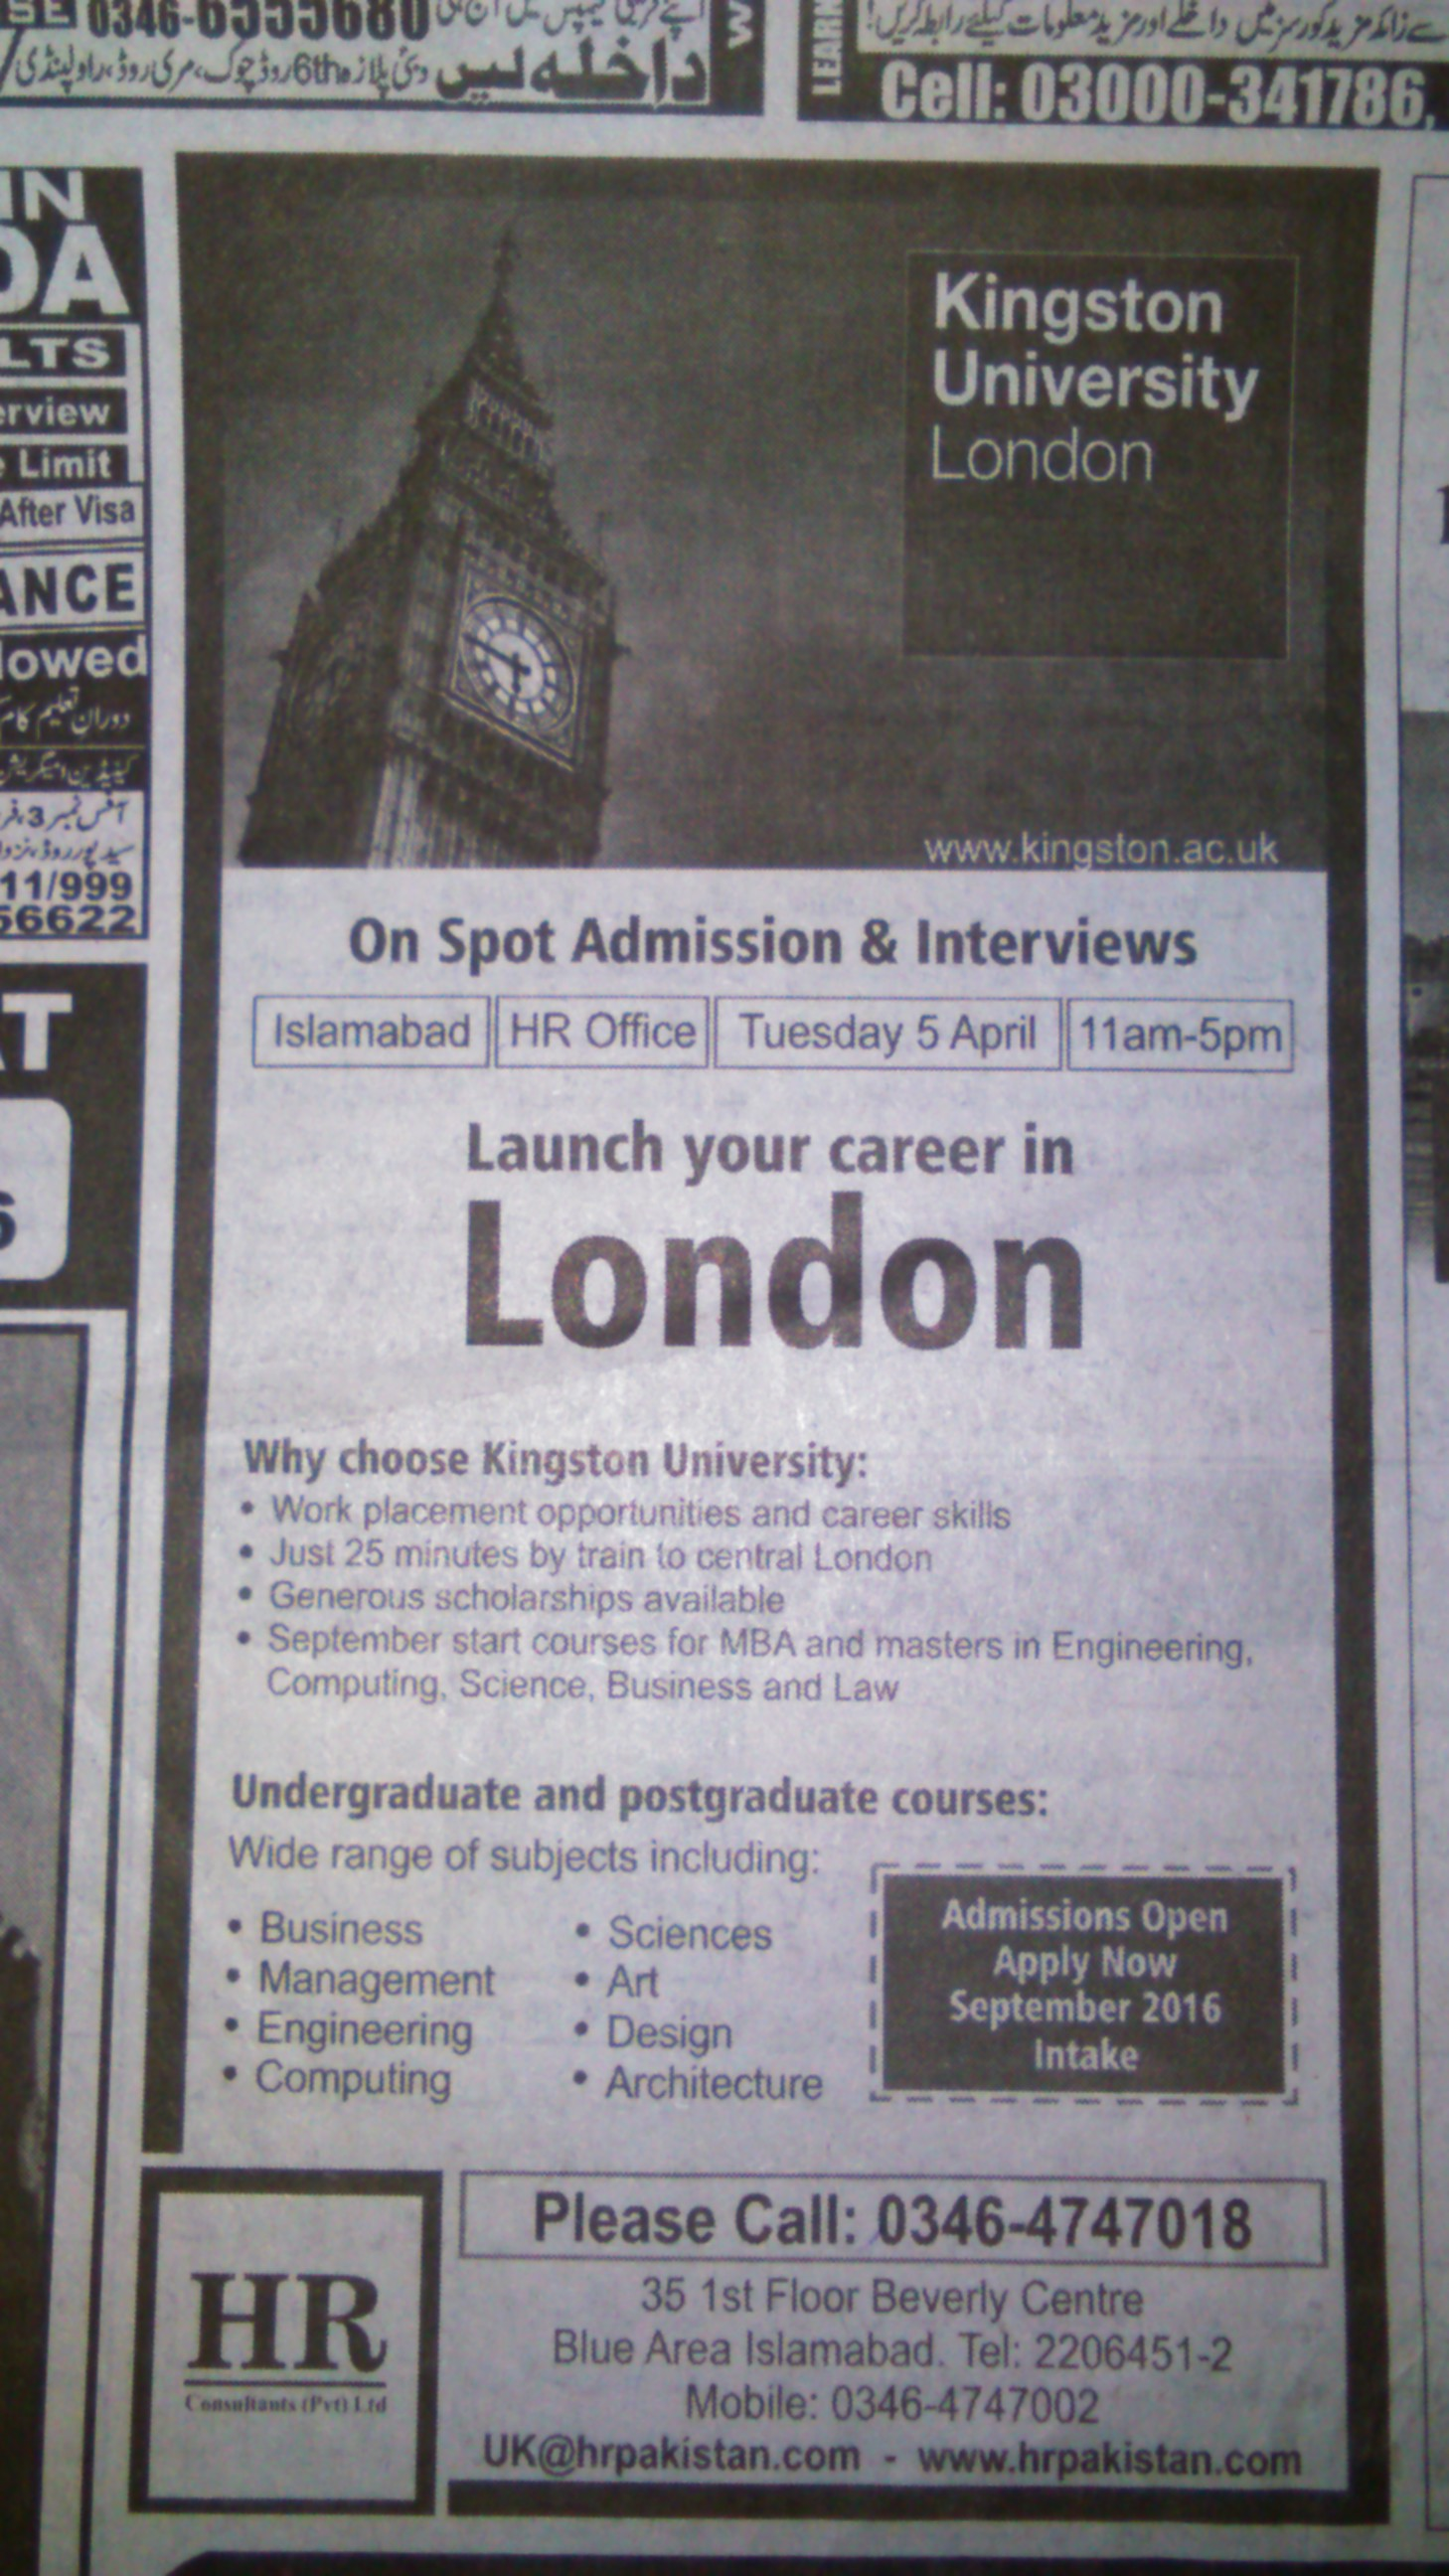 Kingston University London On Spot Admissions